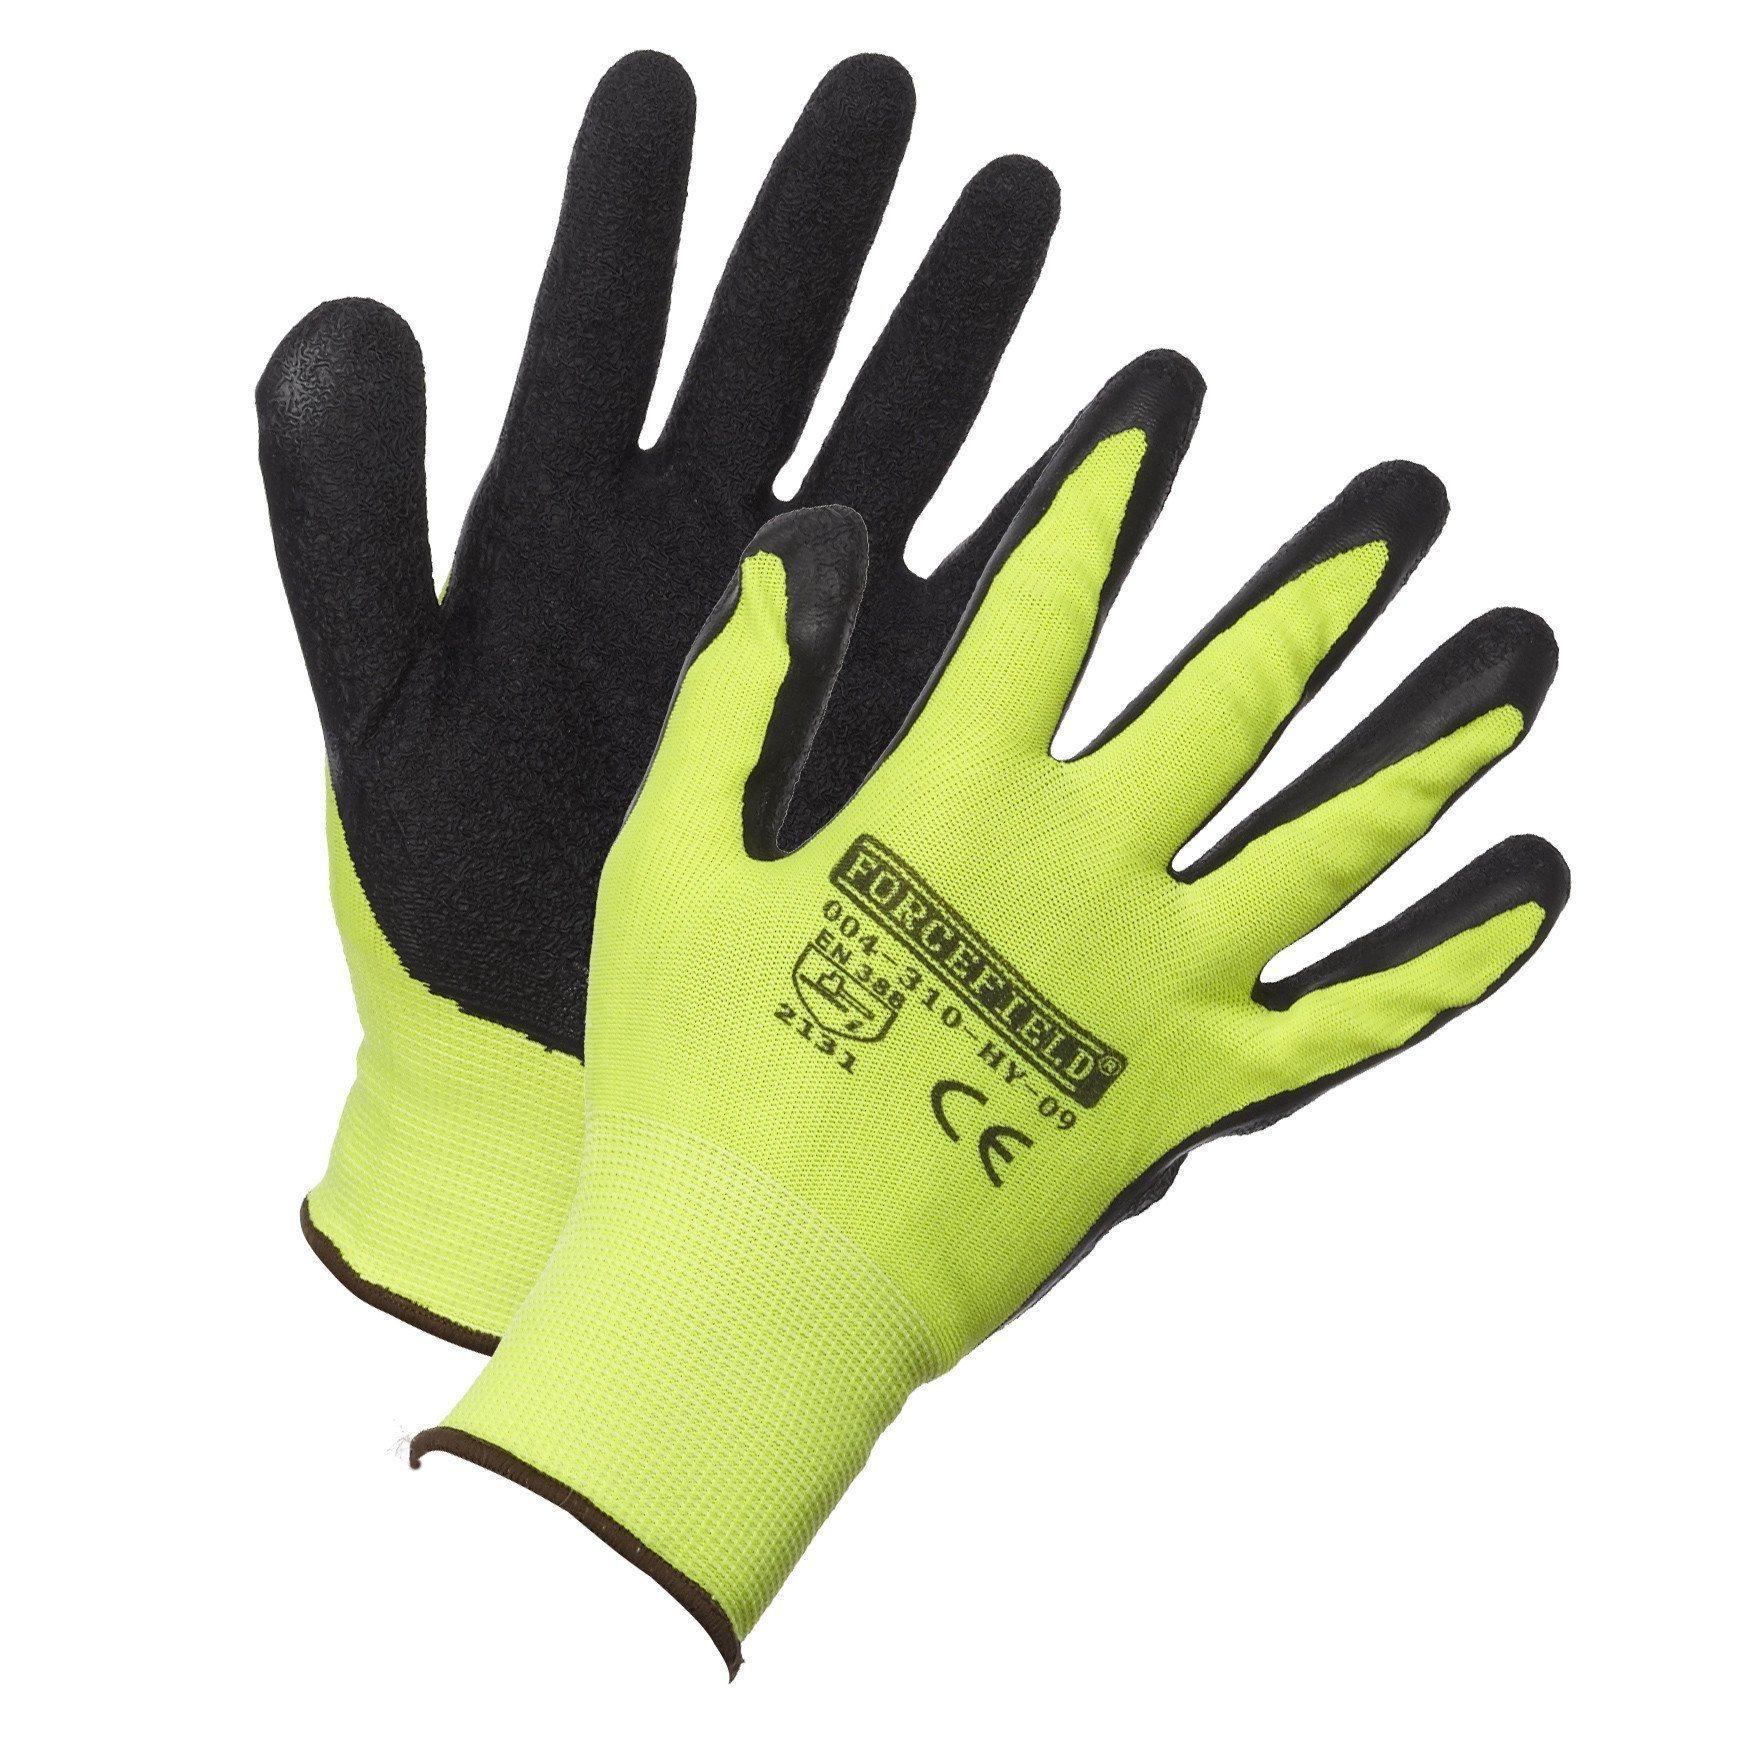 Gloves - Forcefield Hi-Vis Nylon Work Glove, Palm Coated w/Crinkle Latex - YL - L